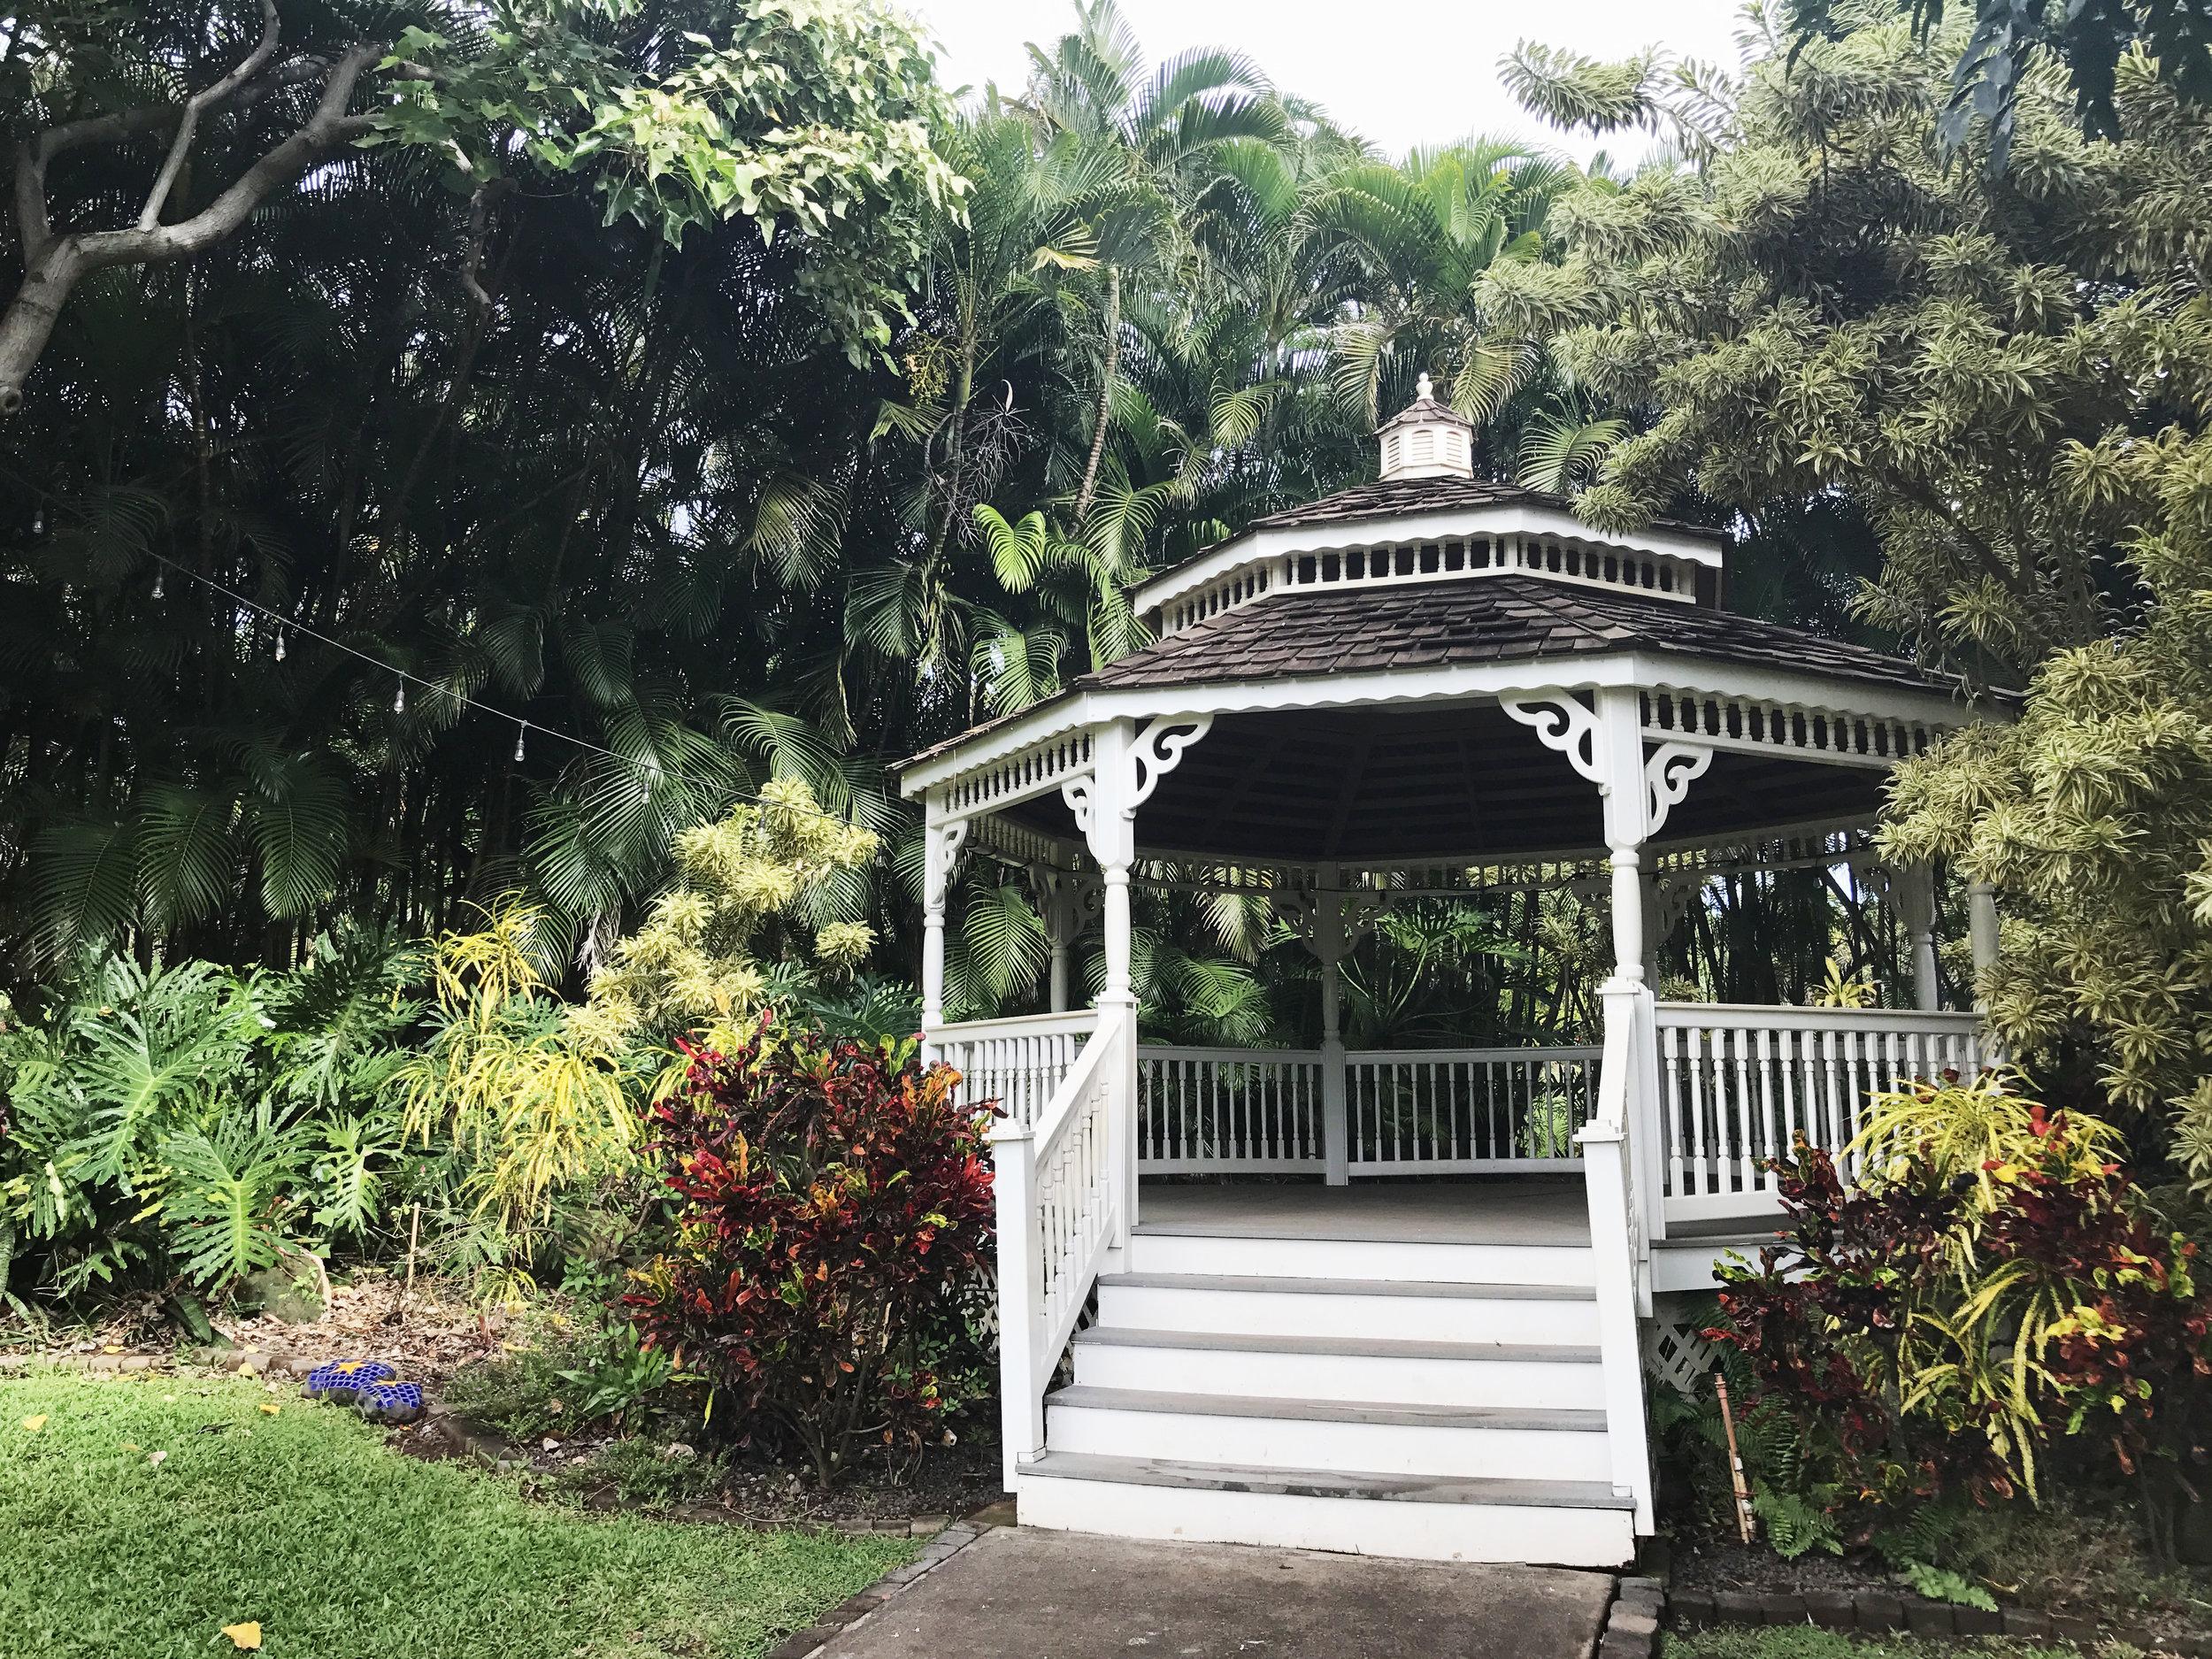 tropical gazebo dreamy vibes